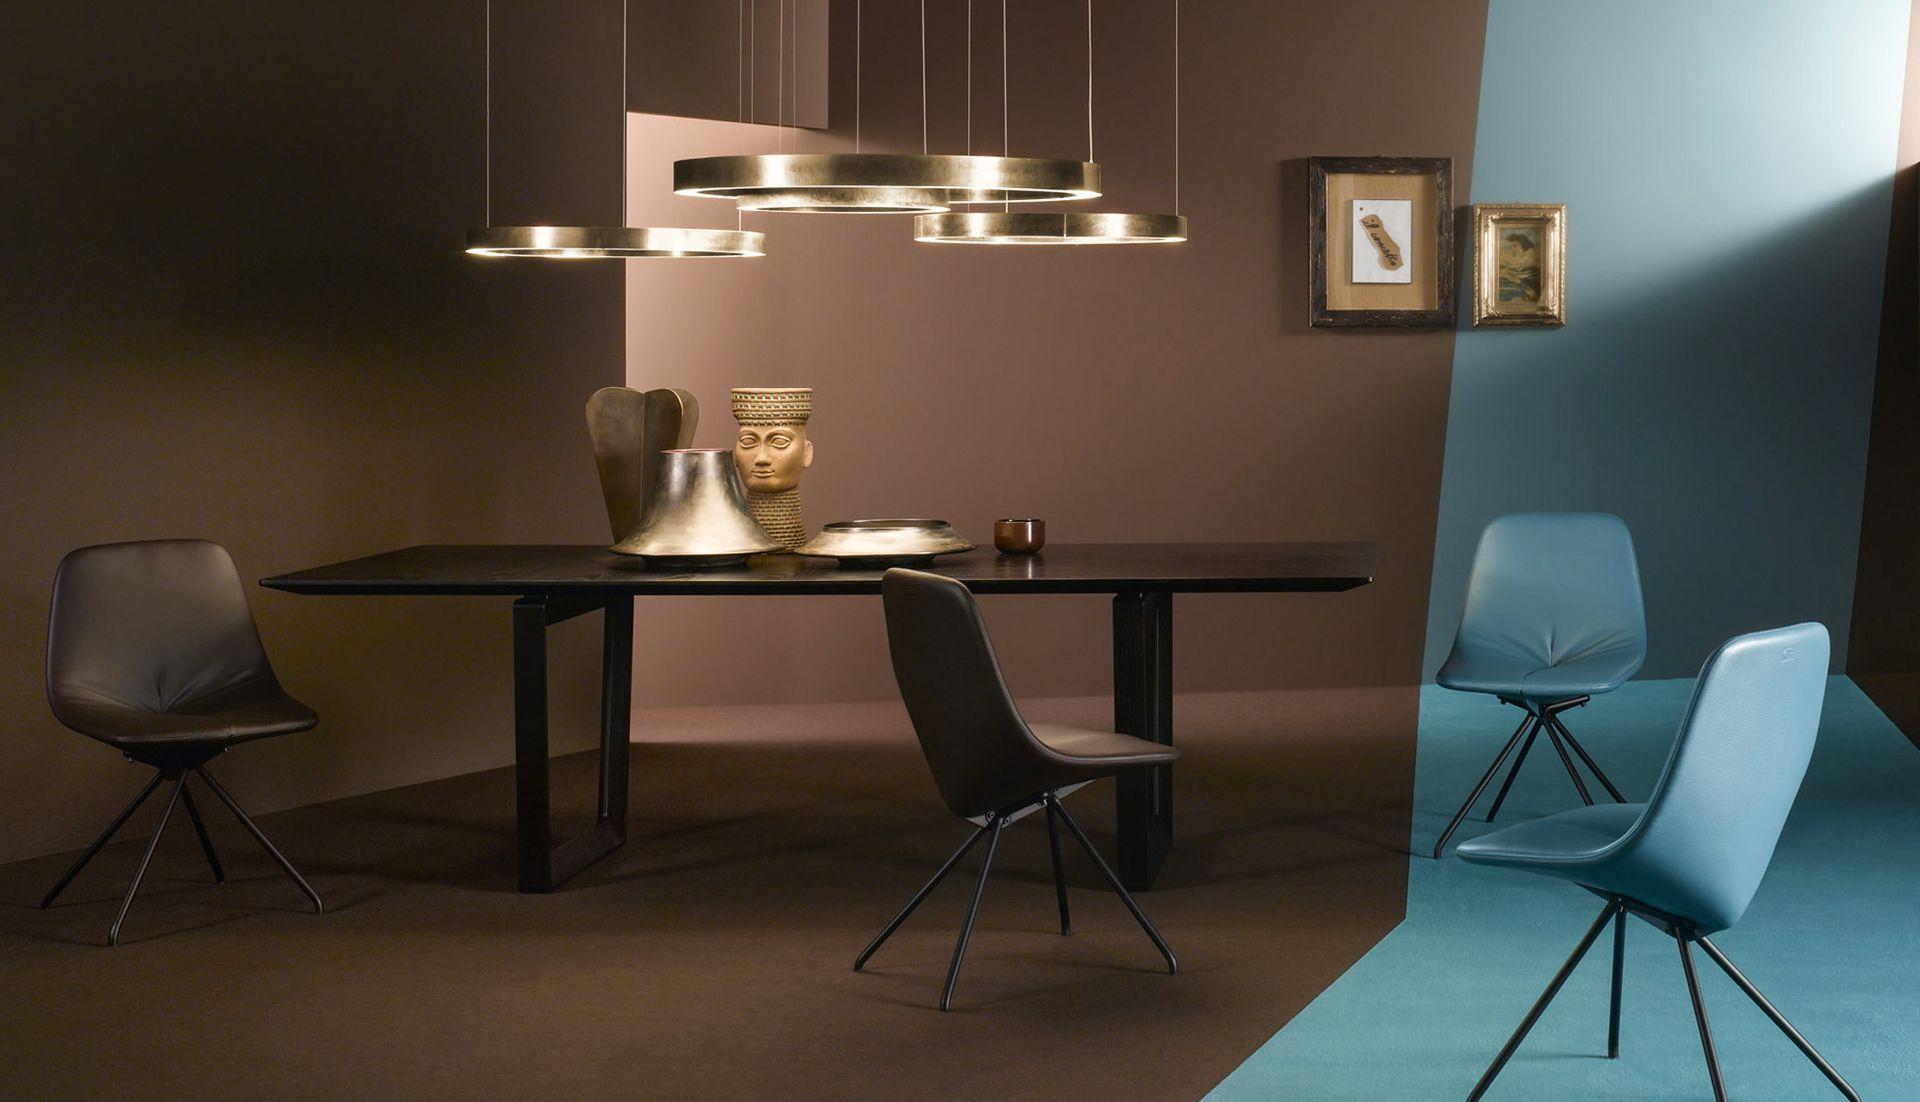 poltrona frau du 30 chair everything but ordinary. Black Bedroom Furniture Sets. Home Design Ideas